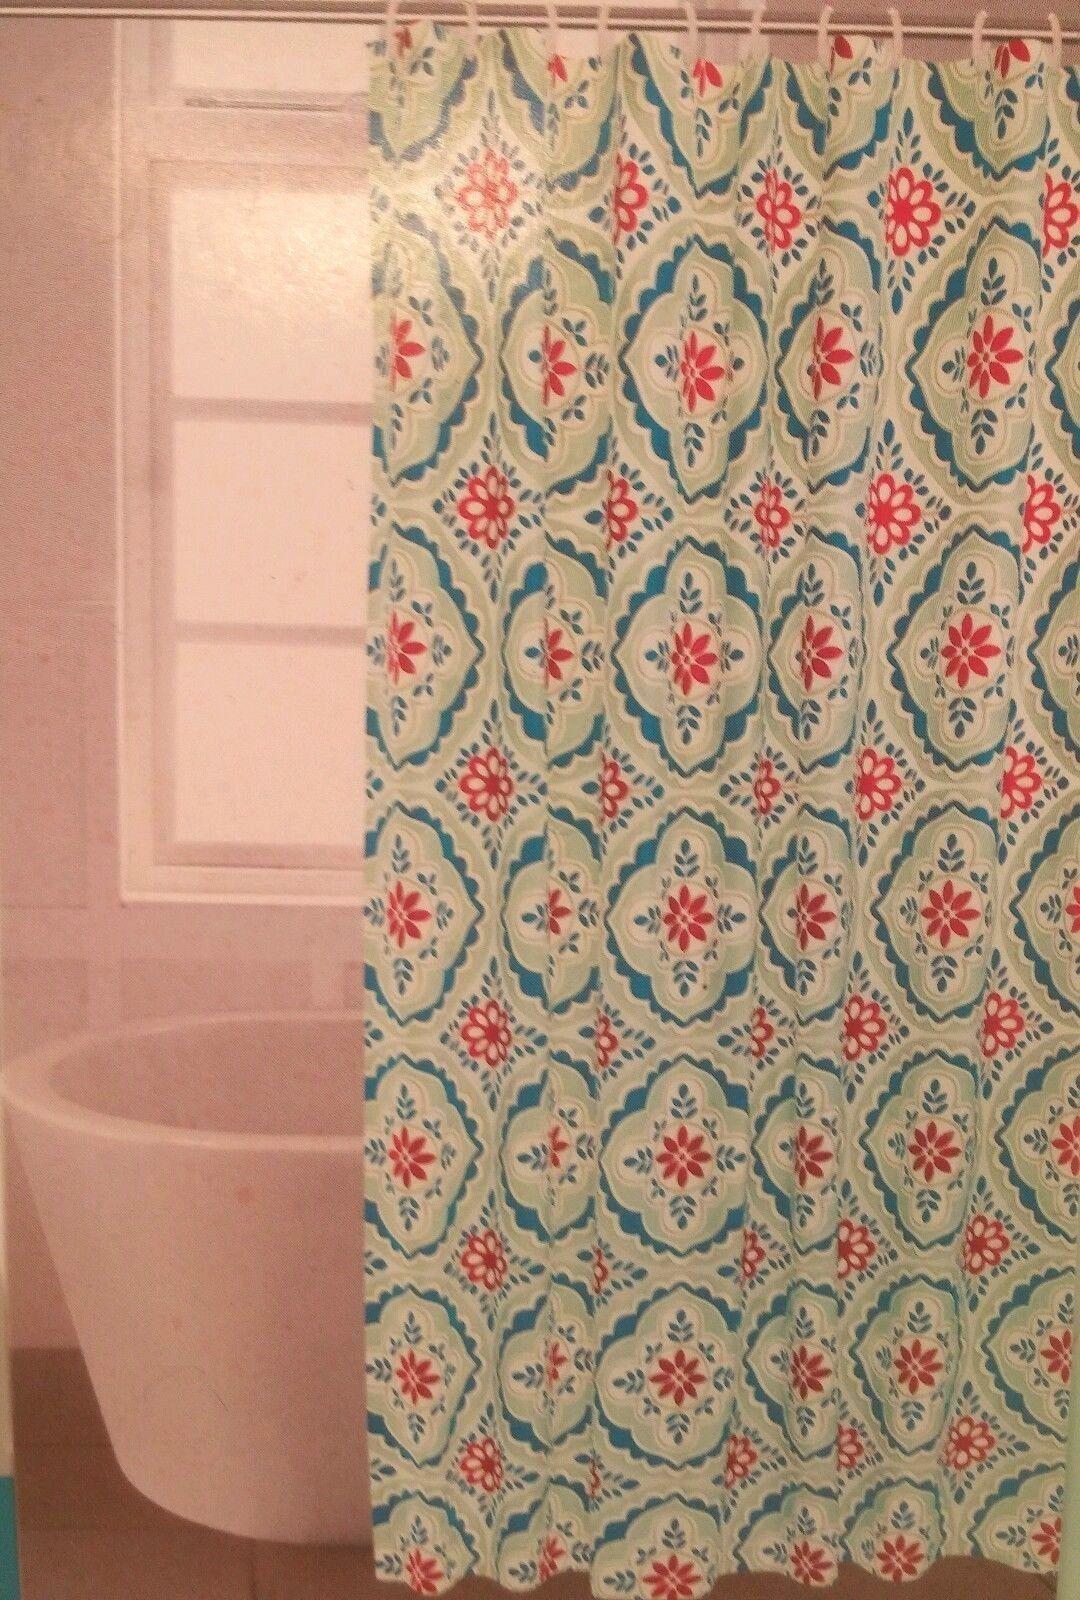 Comfort Bay Designer Print Shower Curtain Or Liner Medallion Red Blue Green New